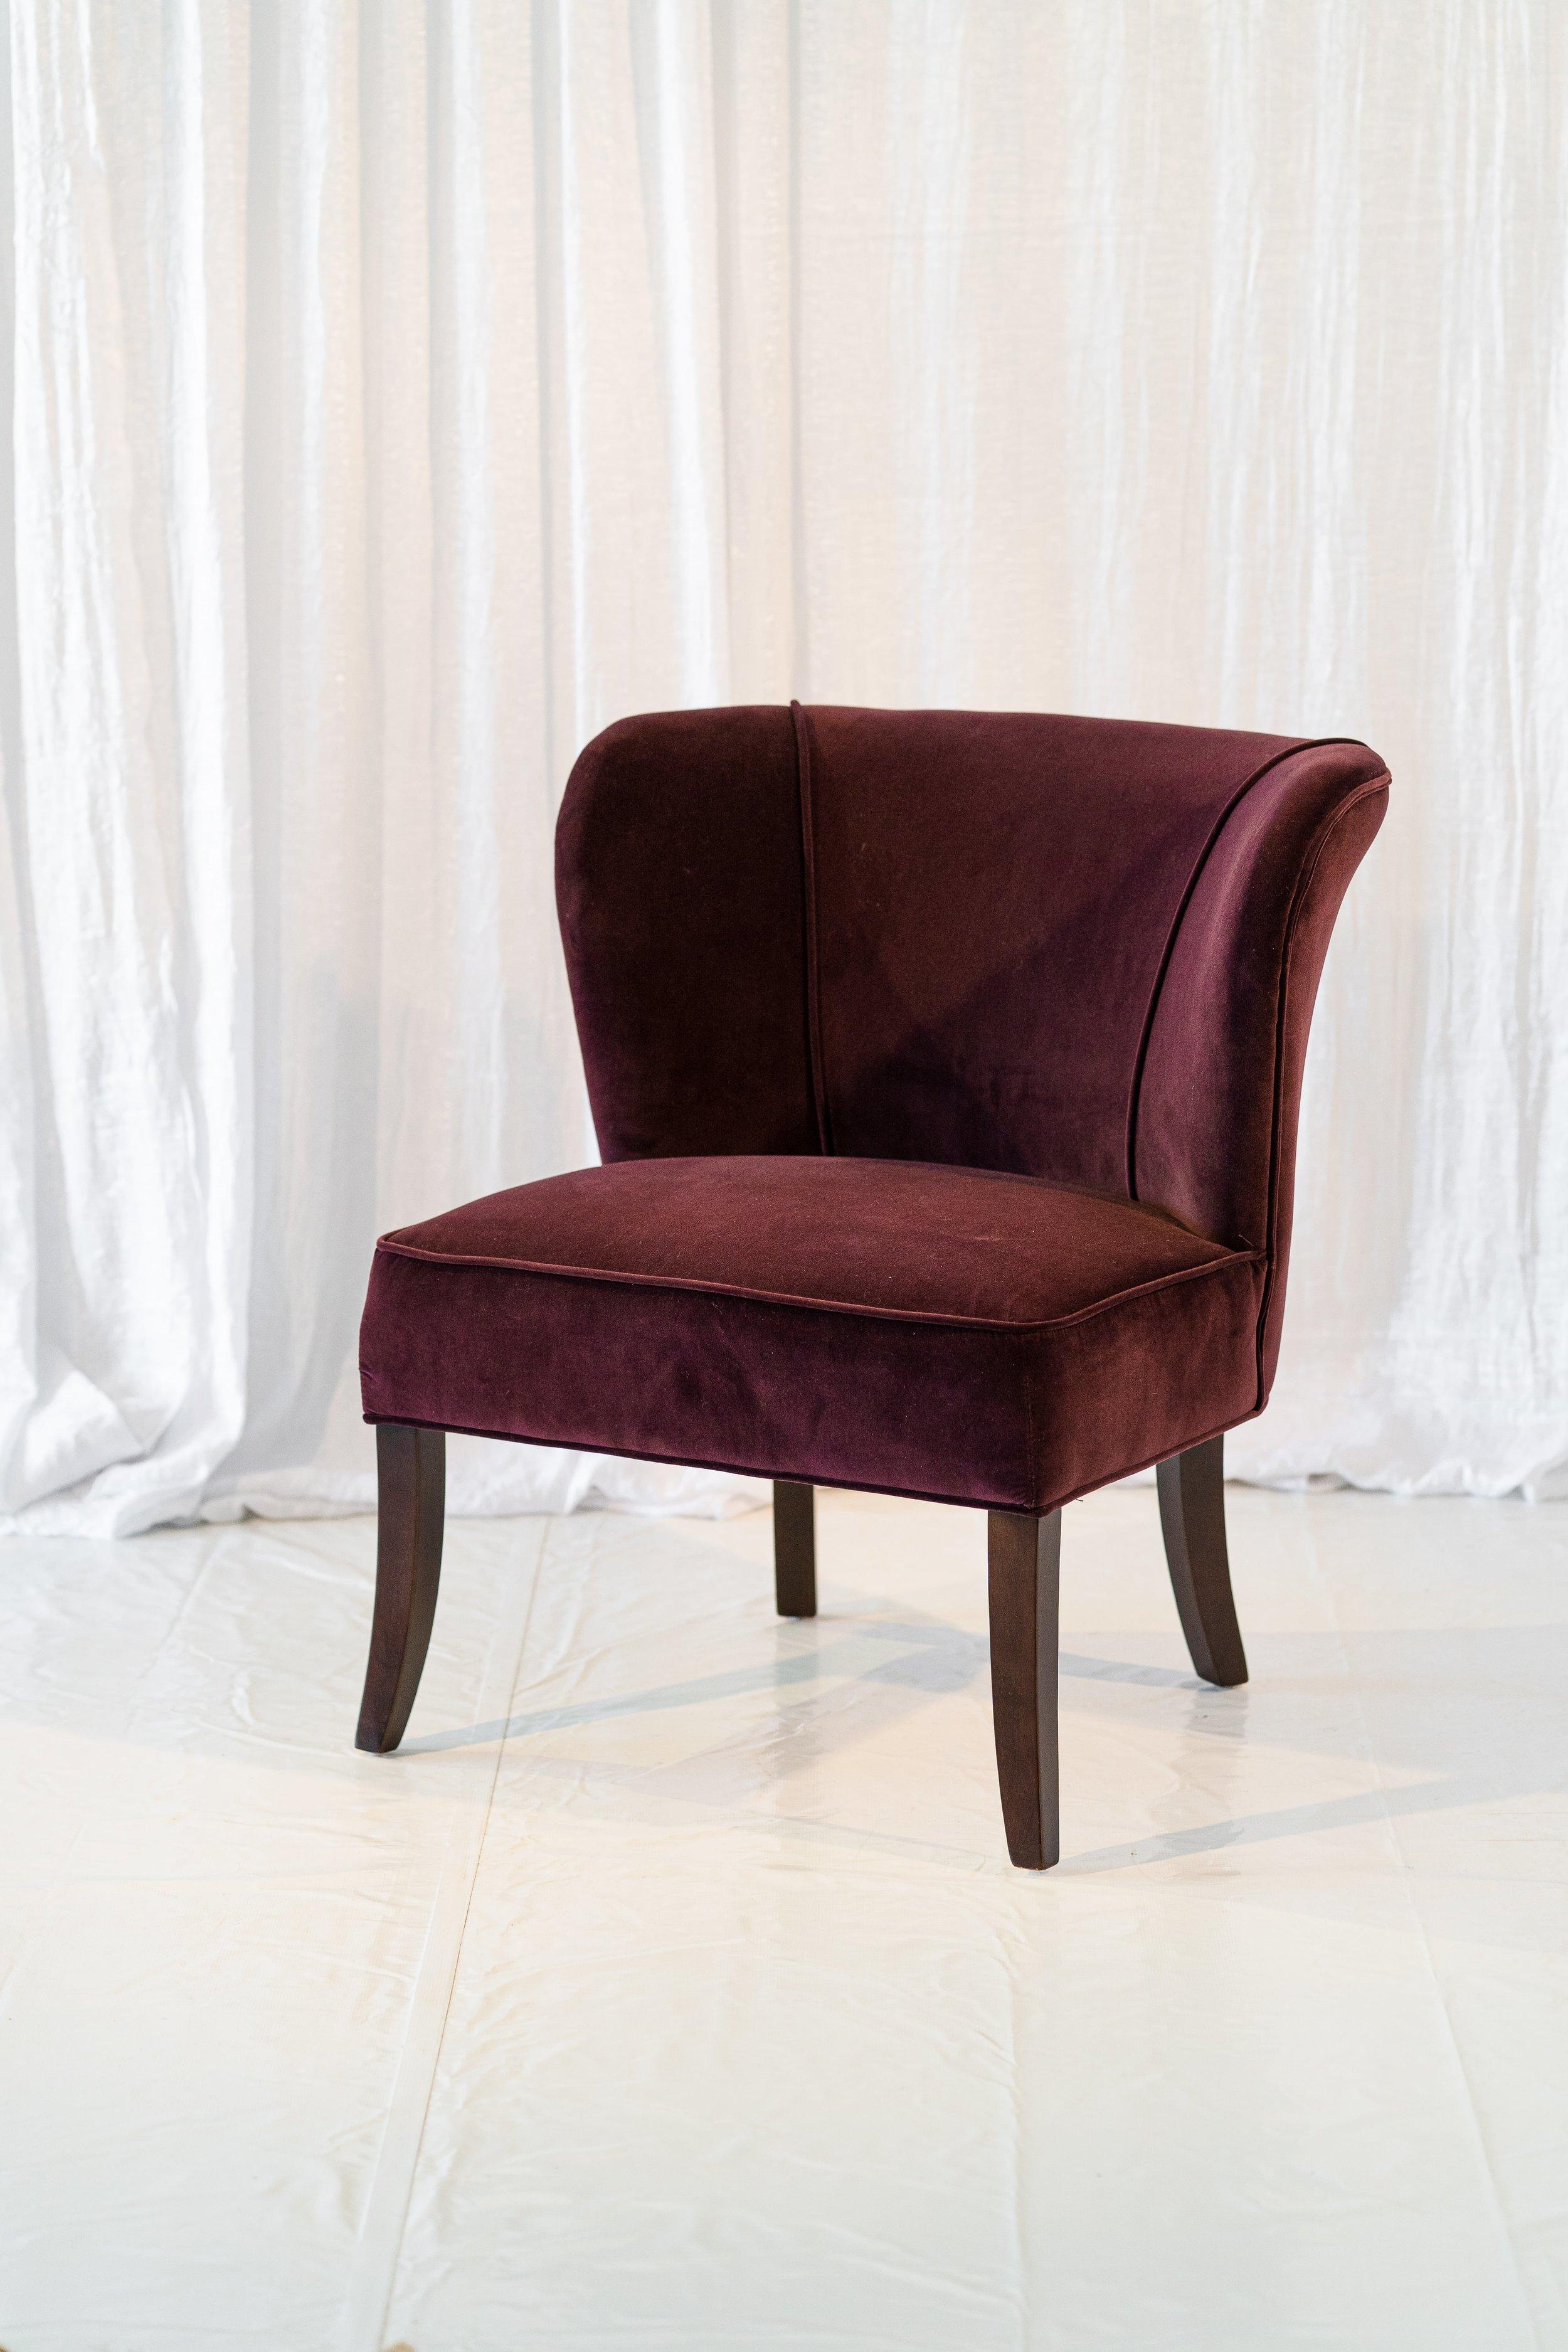 vintage chair images2-8-min.jpg